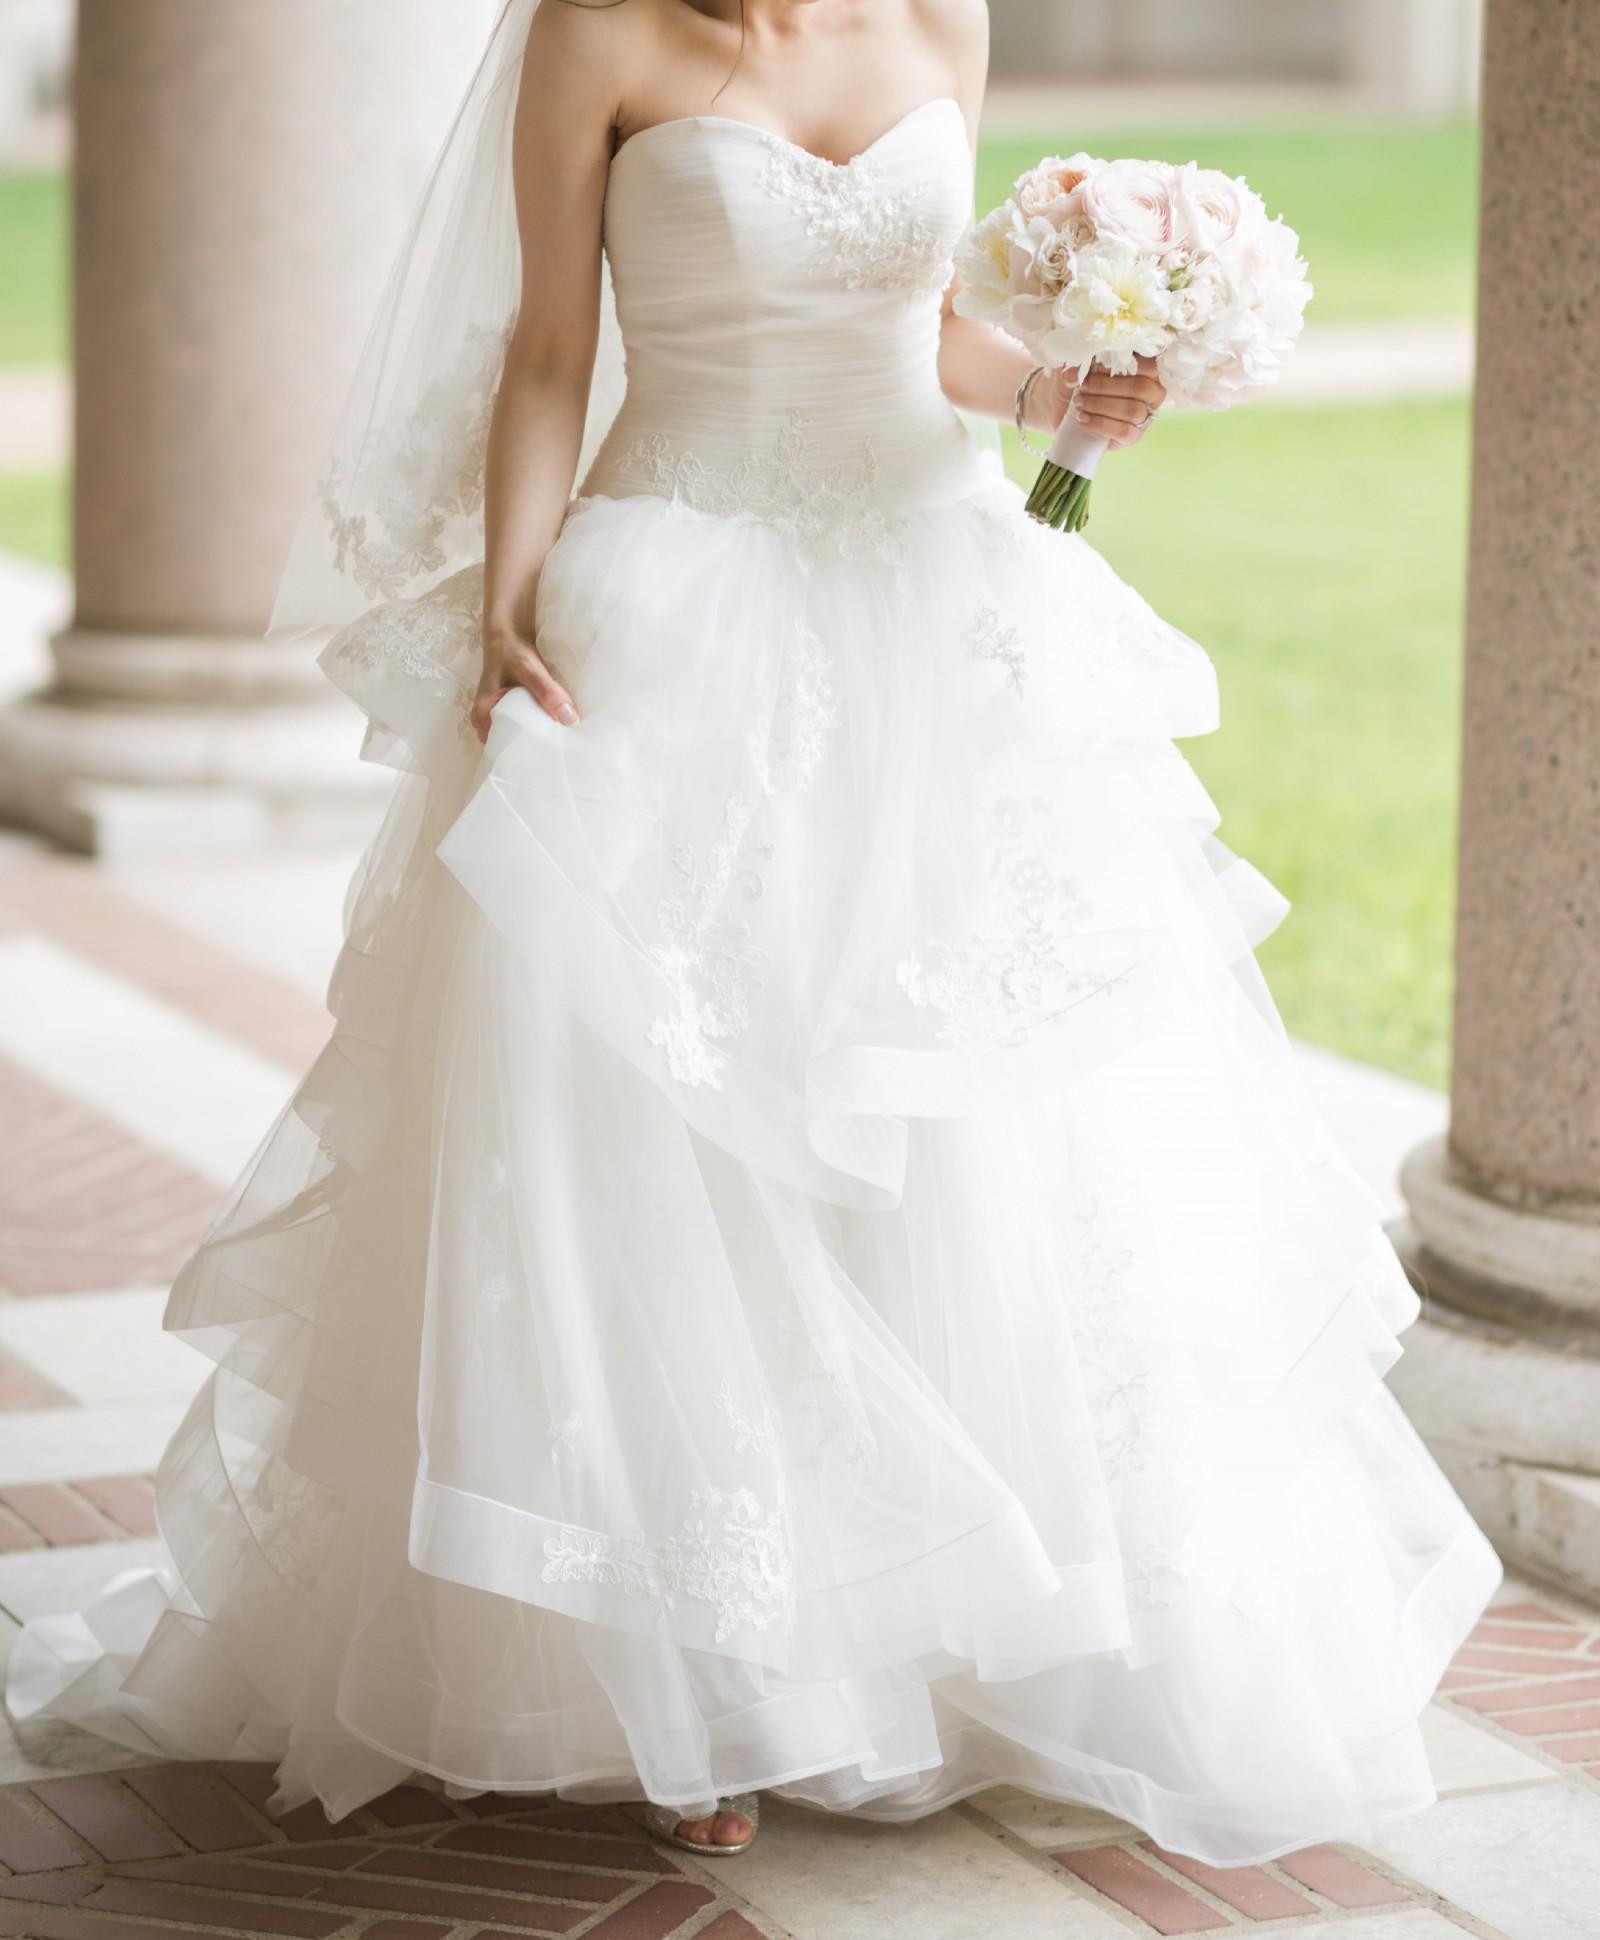 Vera Wang WHITE BY VERA WANG STRAPLESS TULLE WEDDING DRESS